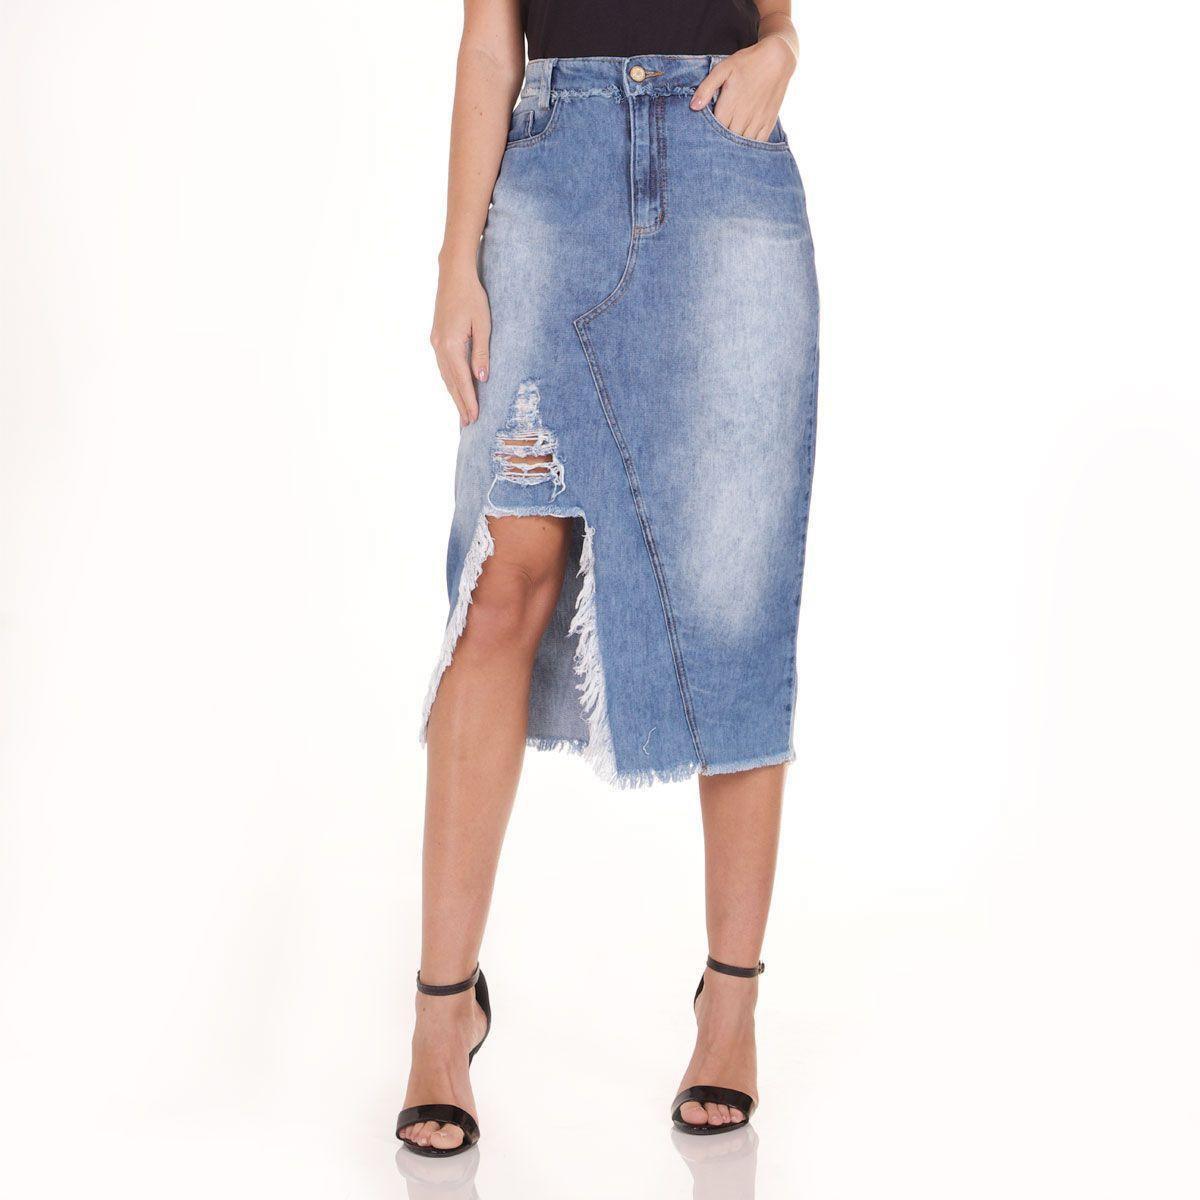 Saia Jeans Areazul Feminina - Azul